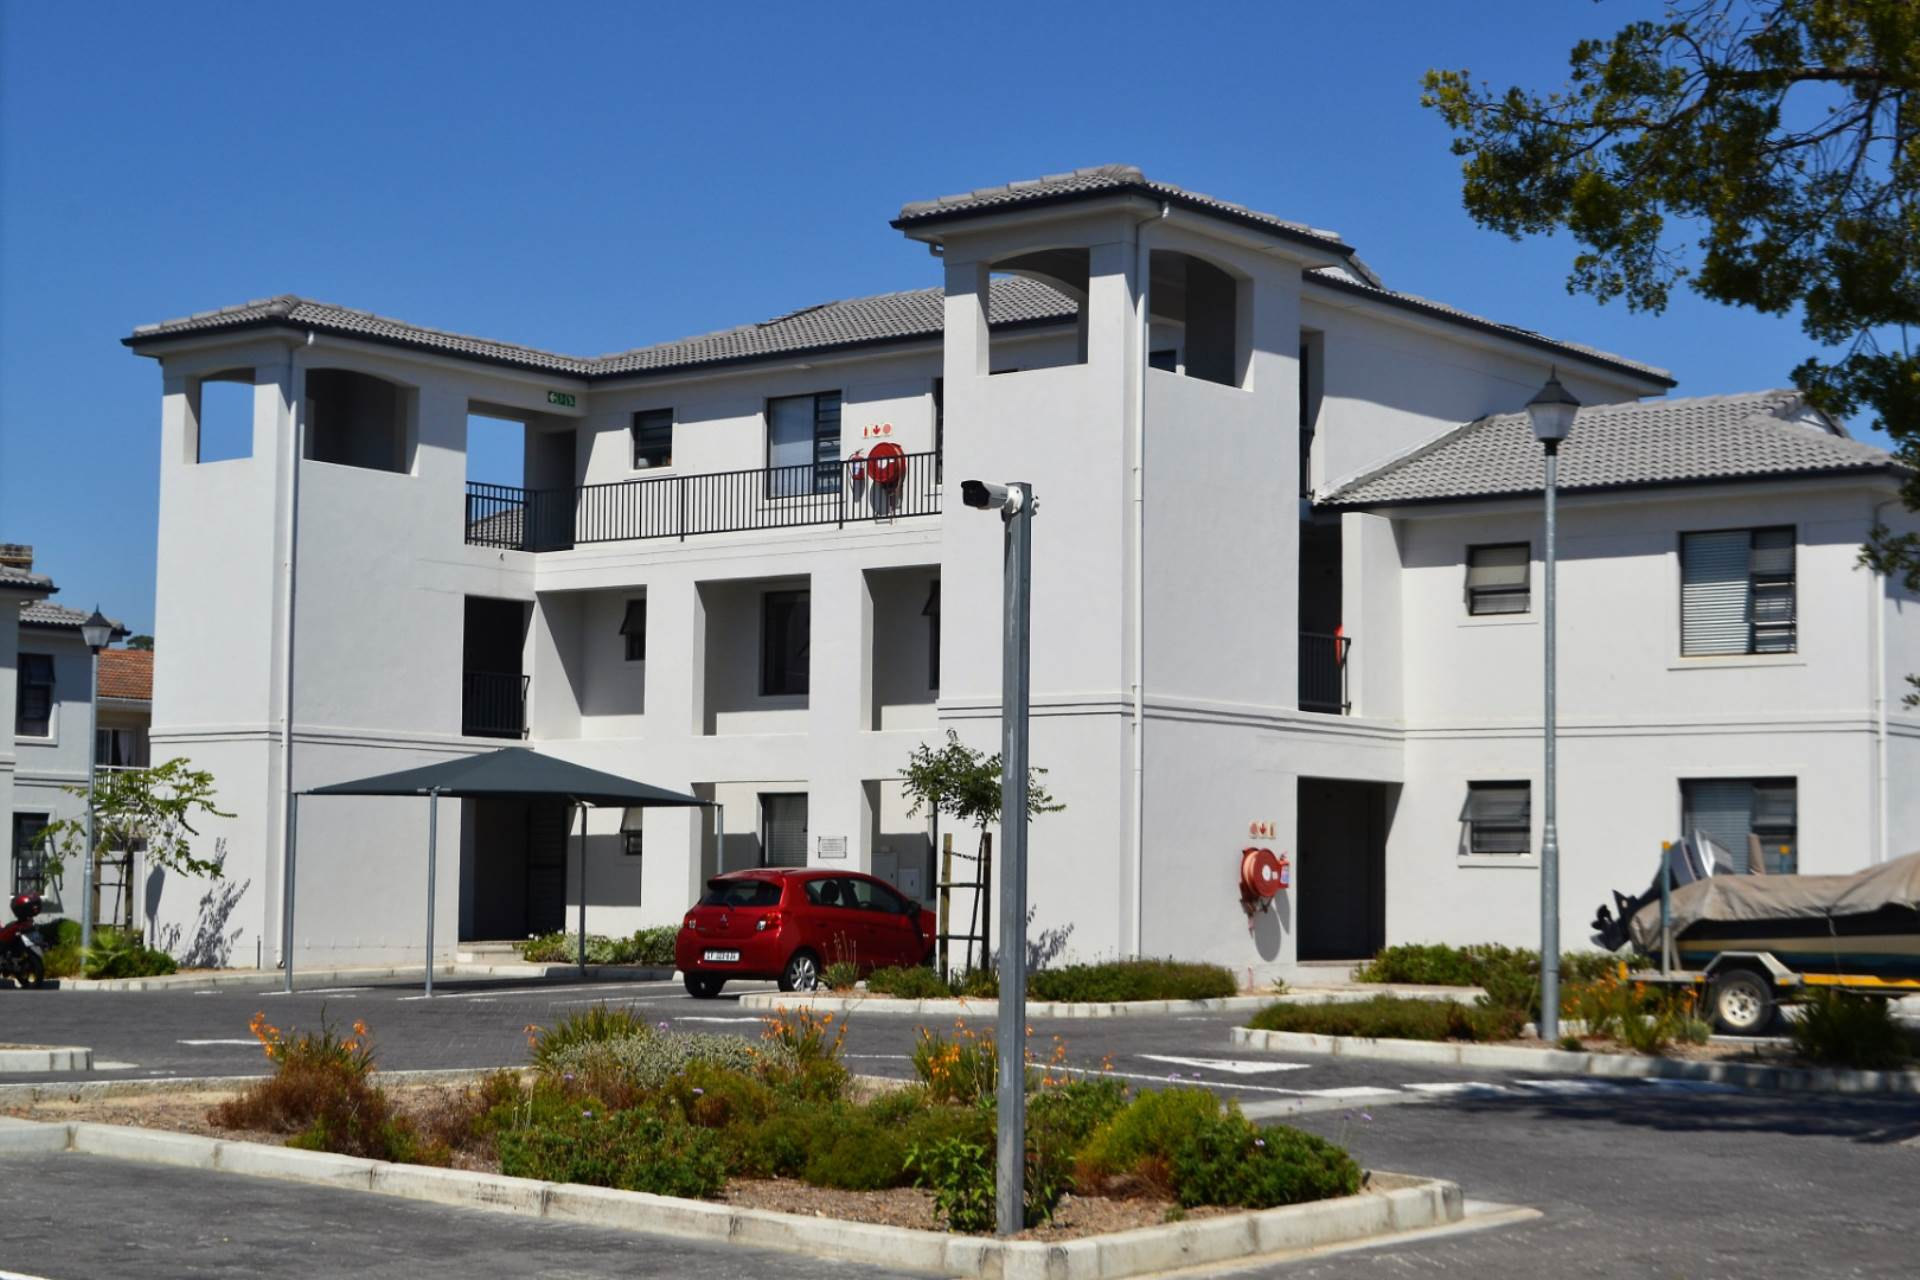 2 BedroomApartment For Sale In Durbanville